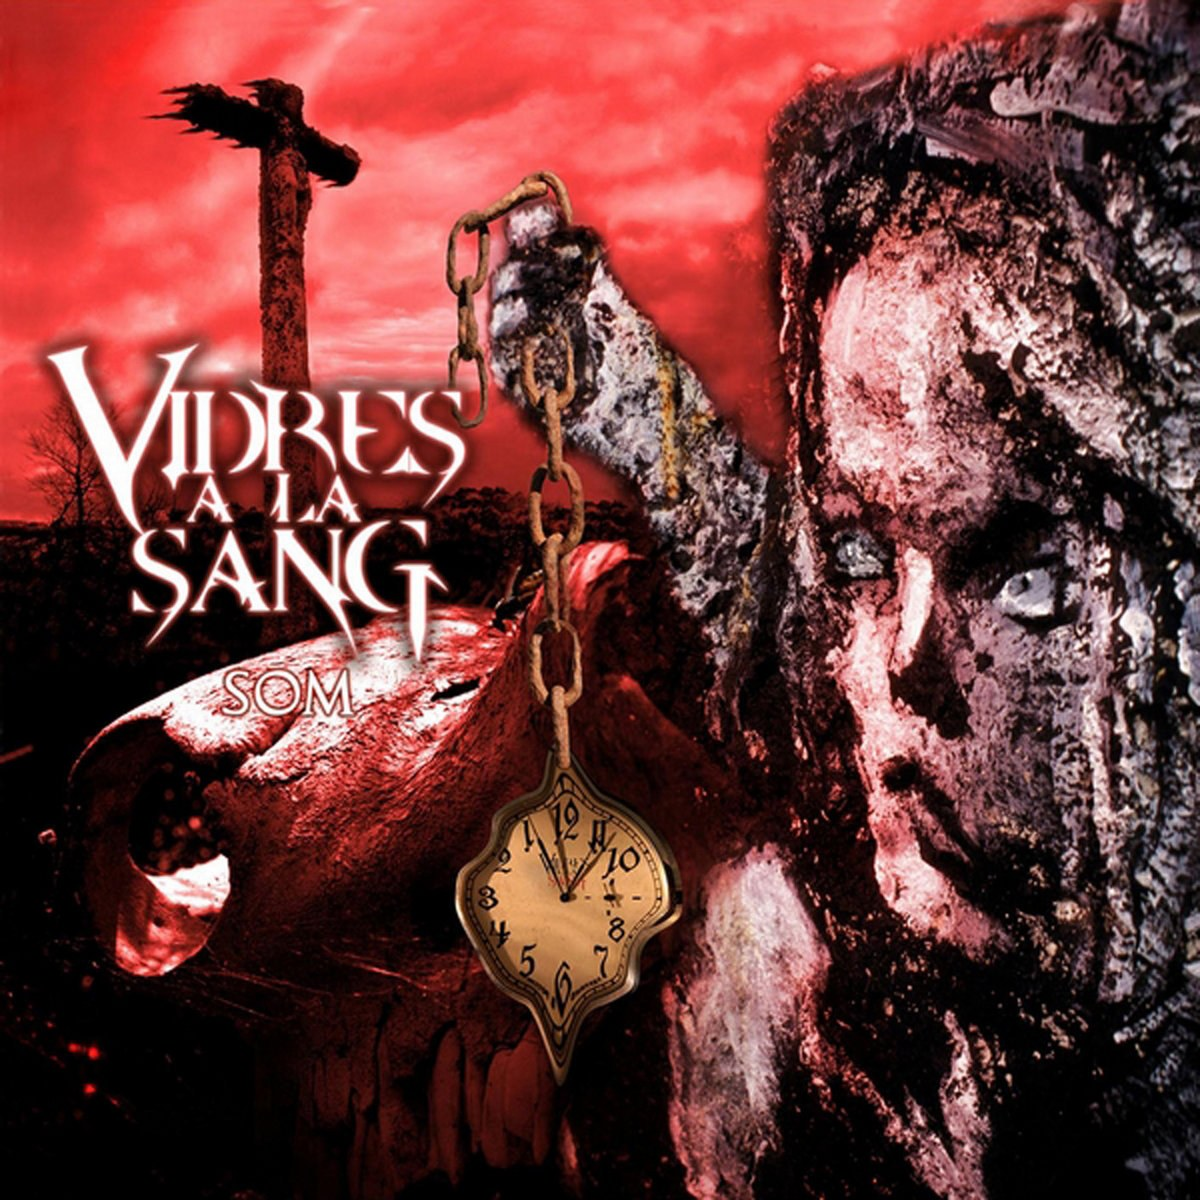 Review for Vidres a la Sang - Som